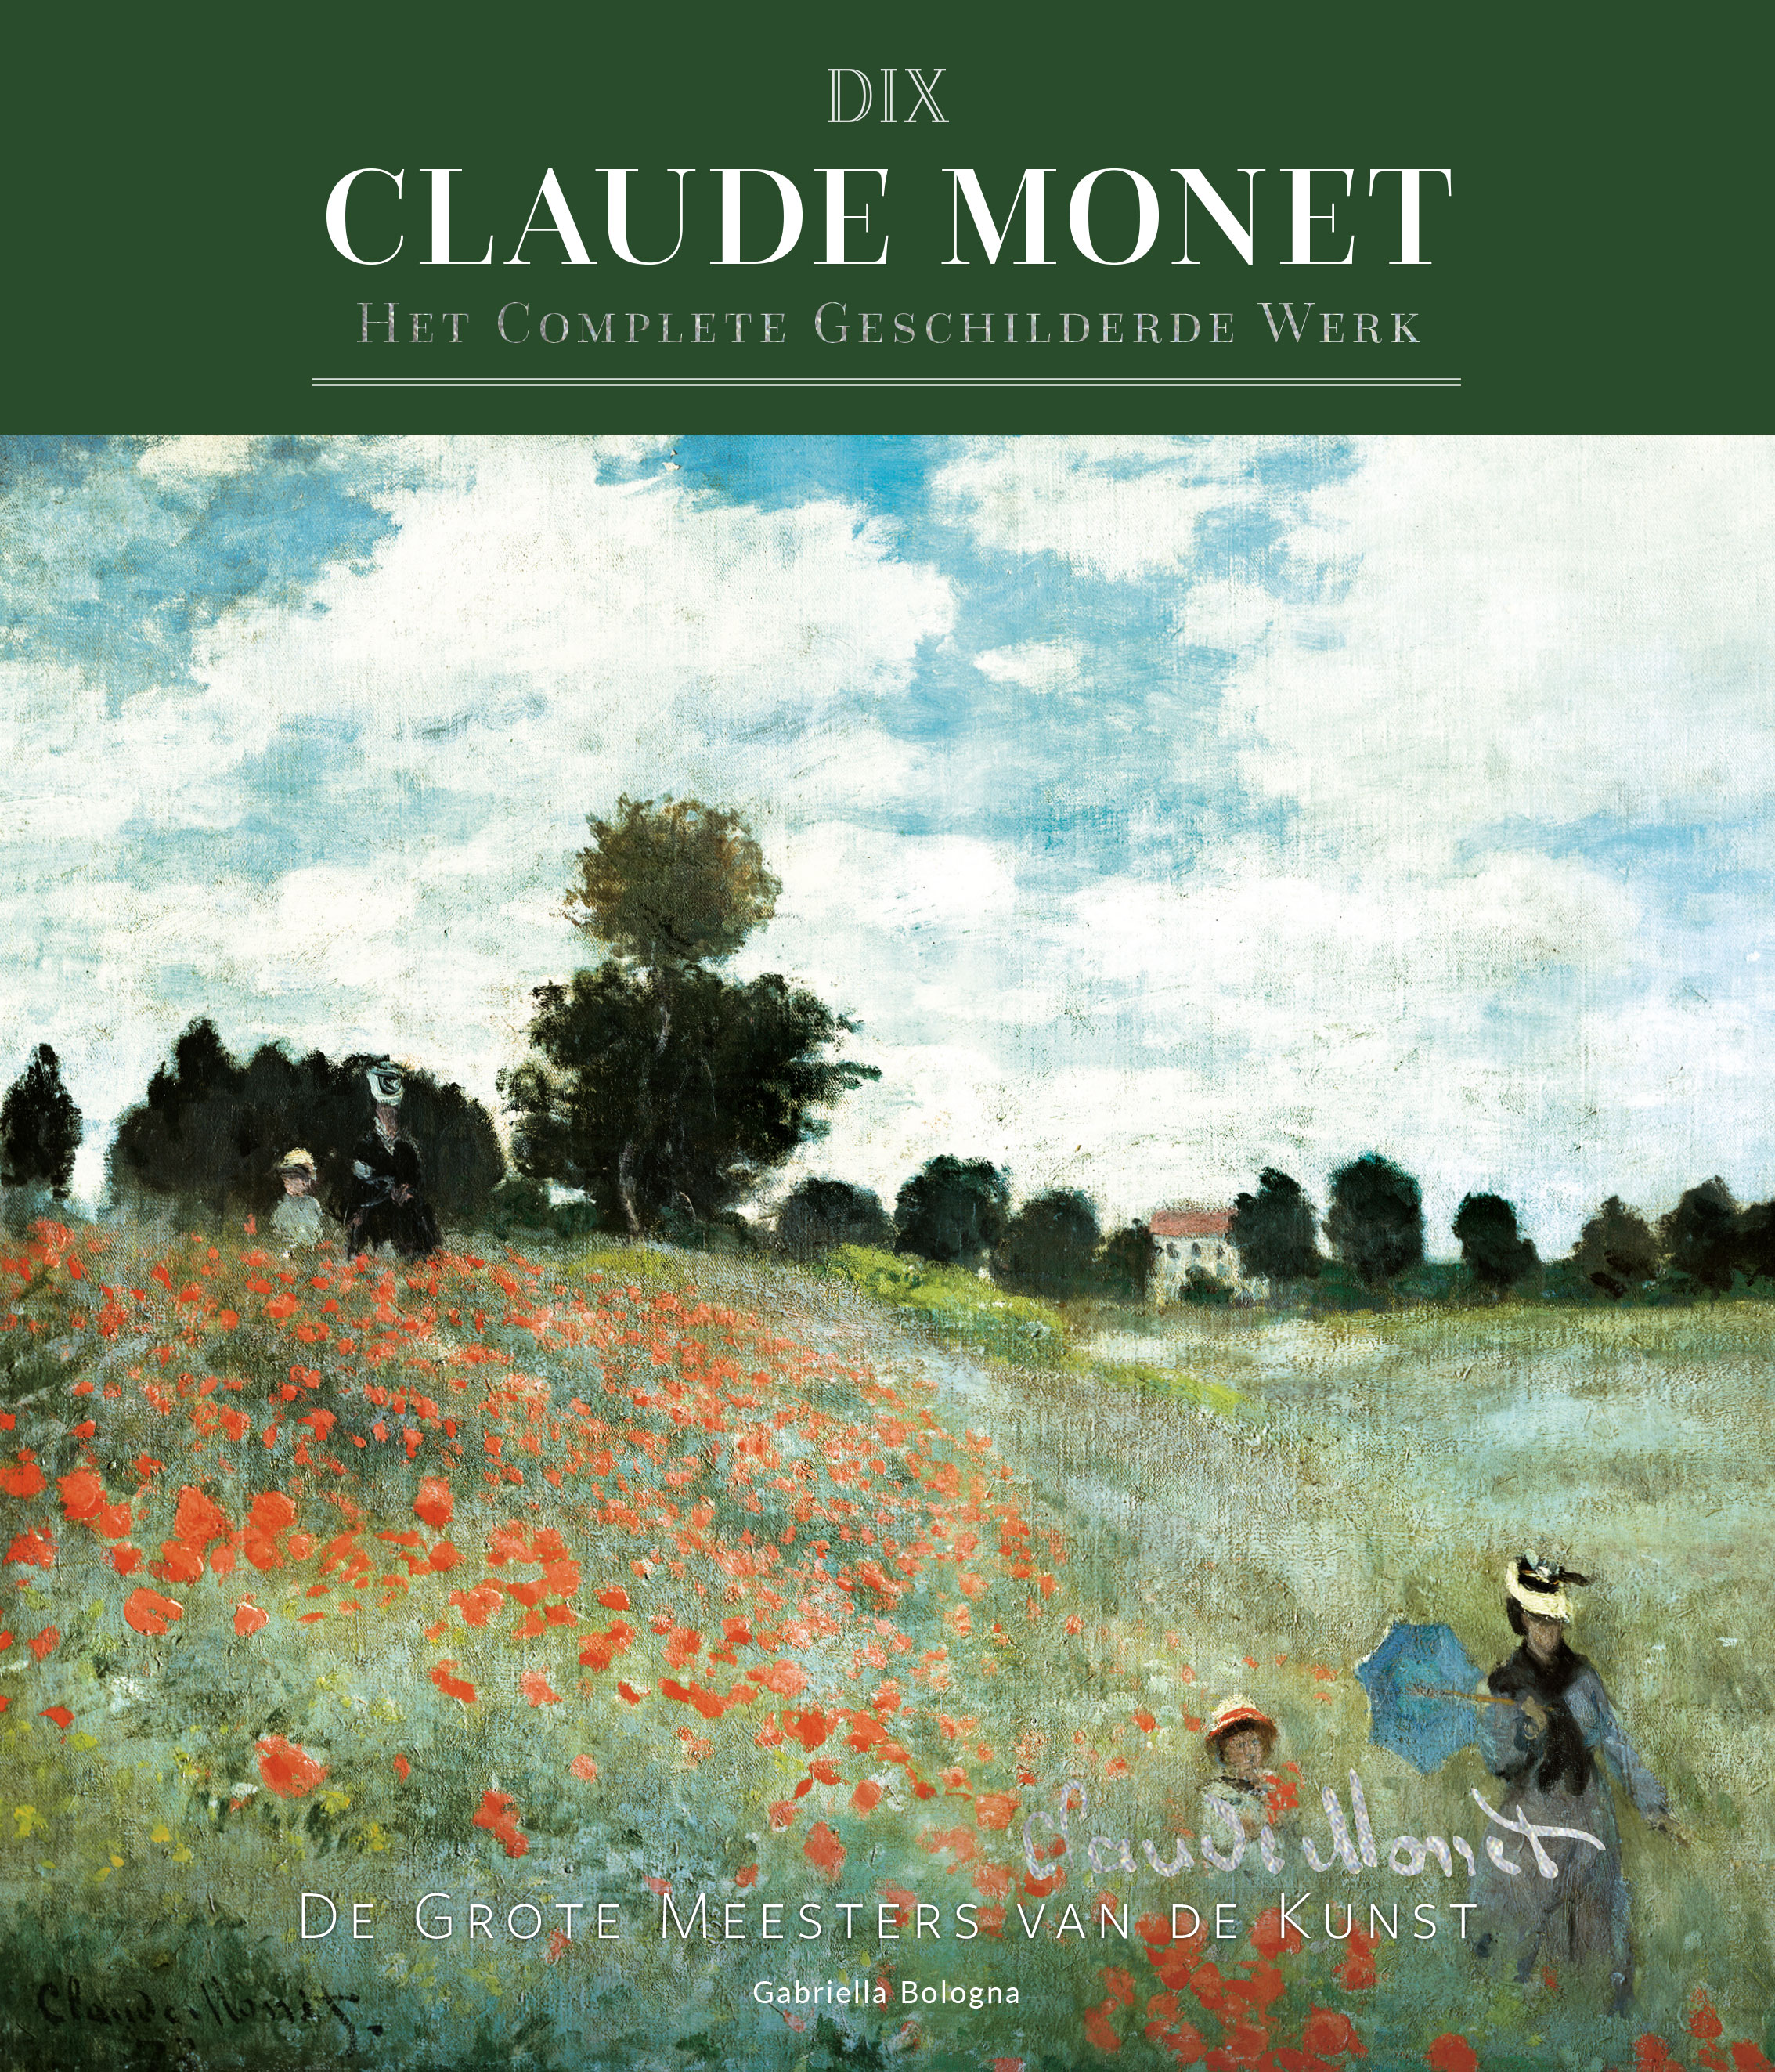 Claude Monet - DIX